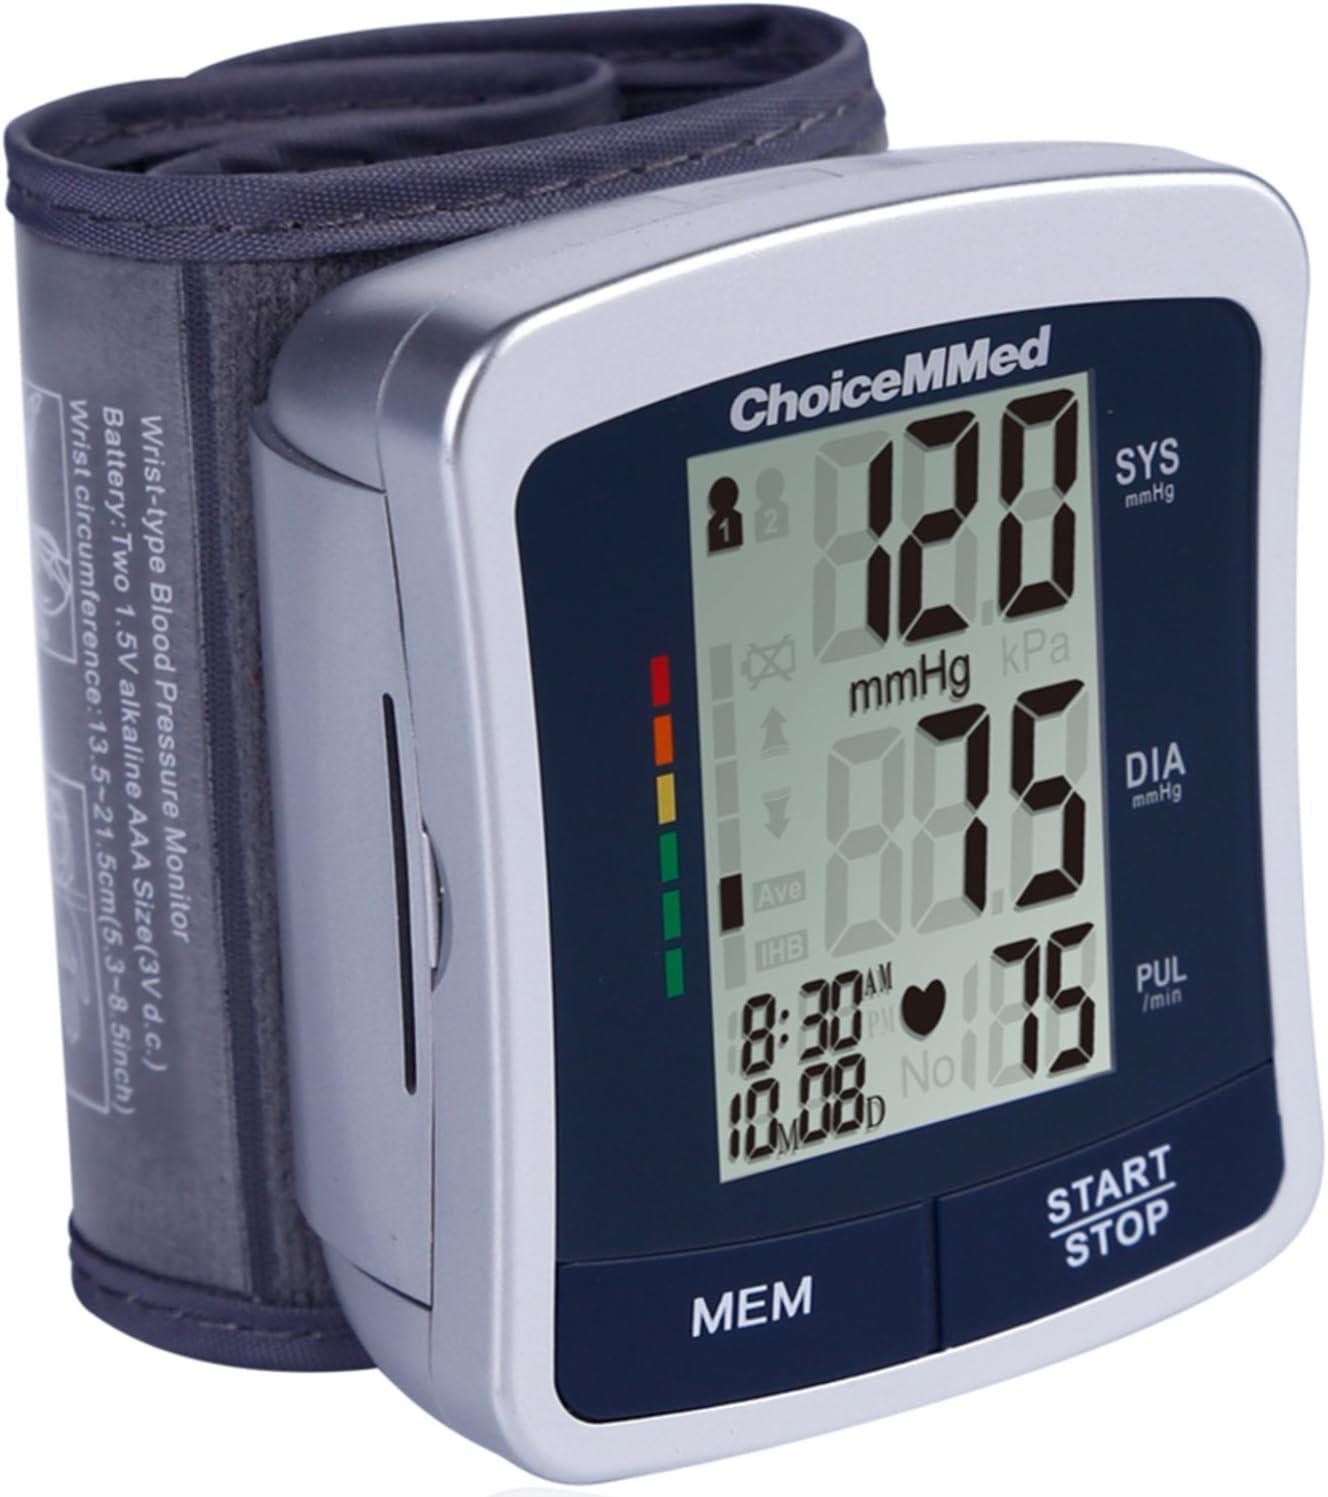 CHOICEMMED Wrist Blood Pressure Monitor – BP Cuff Meter with Display – Blood Pressure Machine up 5.3 -8.5 Wrists – Blood Pressure Tester Kit with Case – Blood Pressure Gauge with Memory